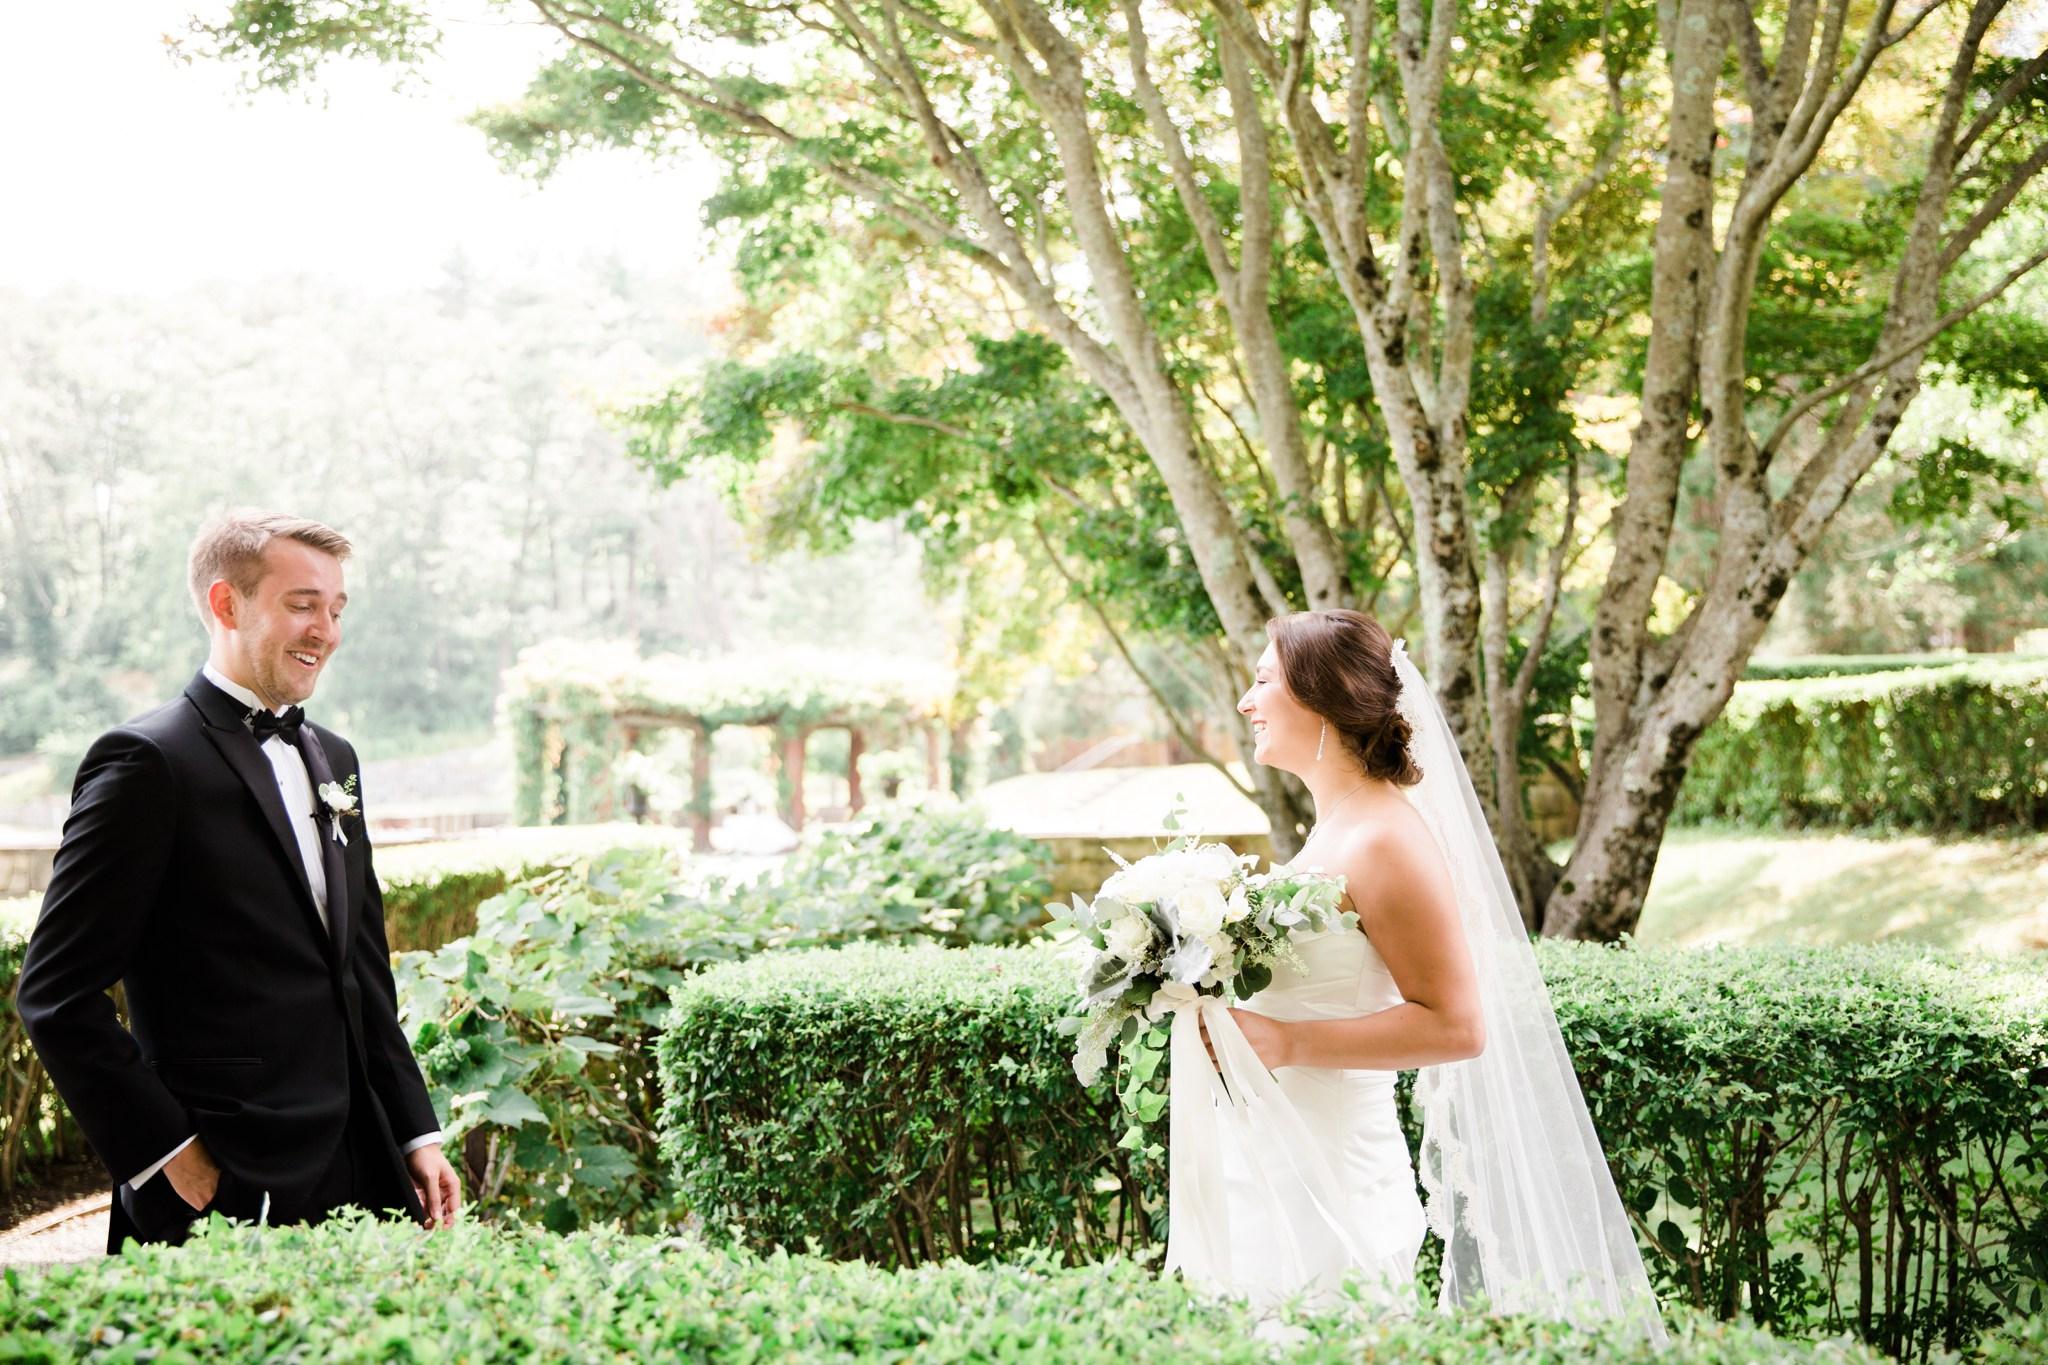 turner_hill_wedding_photos_00015.JPG